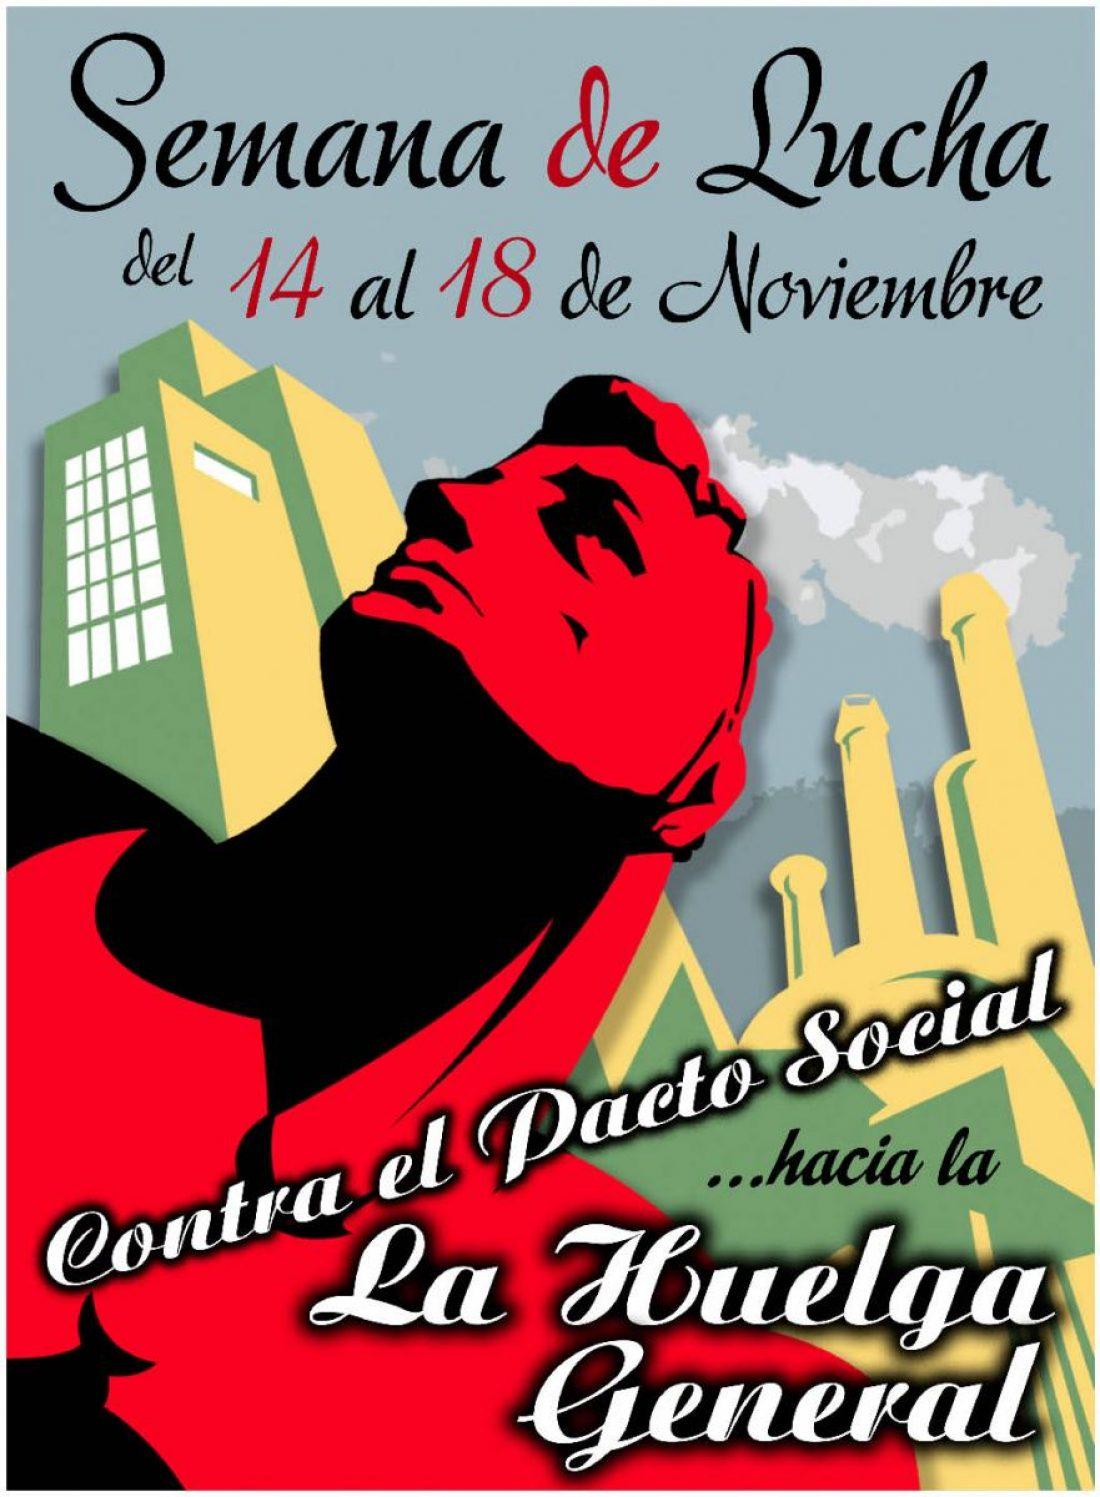 14-18 de Noviembre: Convocatorias para la Semana de Lucha